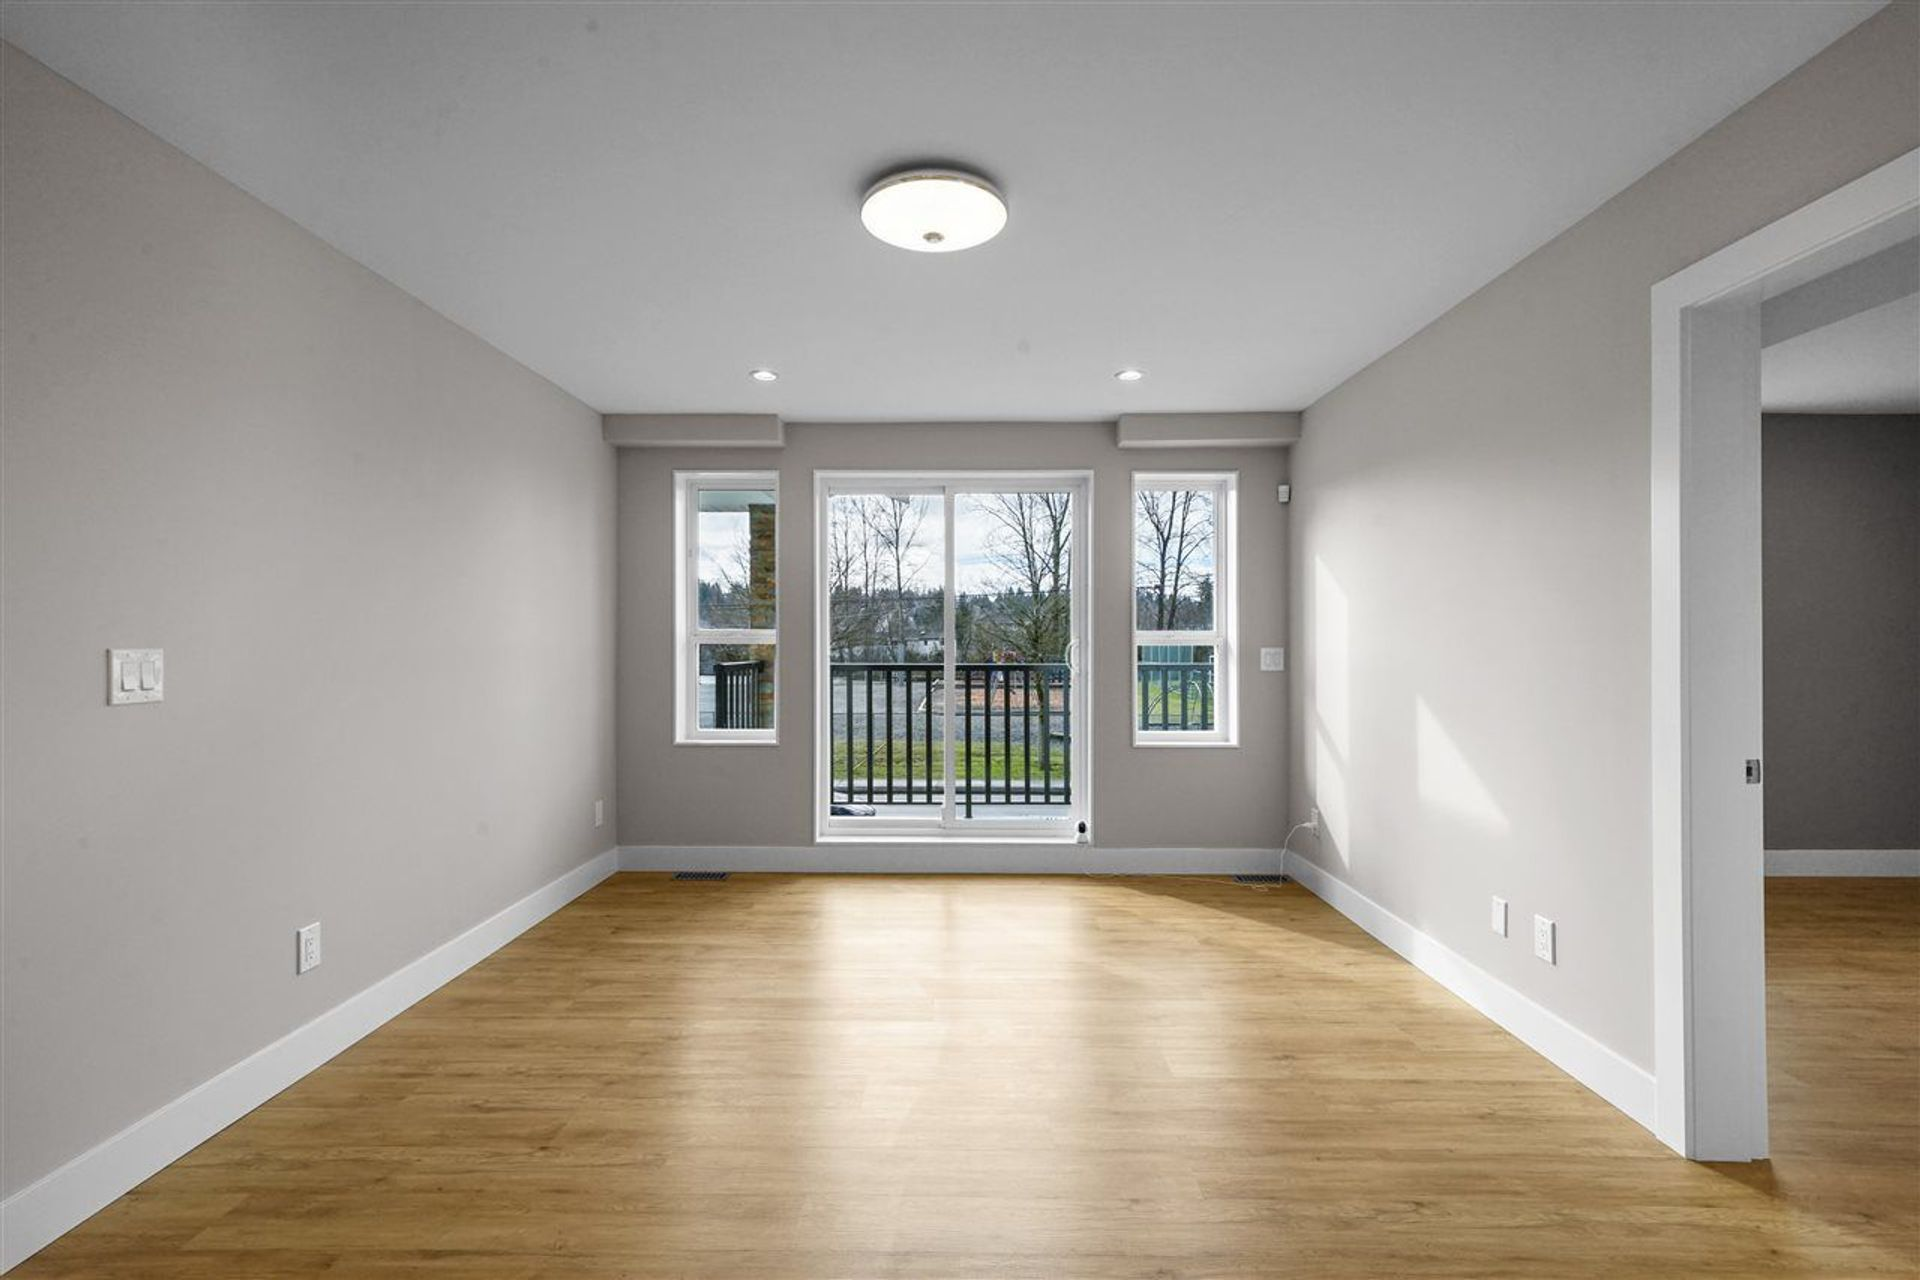 12857-115a-avenue-bridgeview-north-surrey-05 at 12857 115a Avenue, Bridgeview, North Surrey